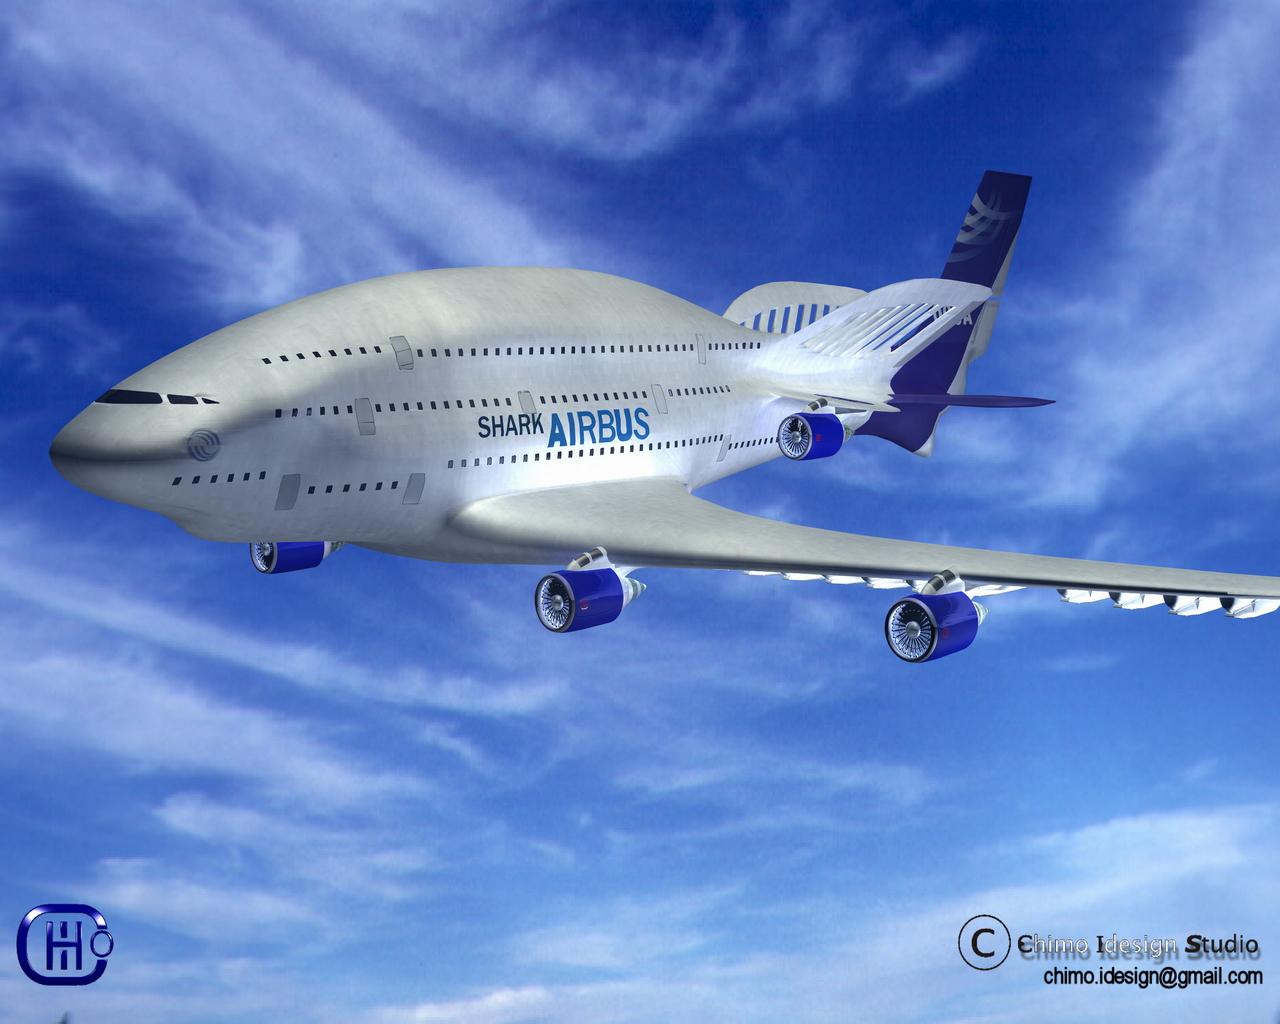 Emirates Wallpaper Hd Airbus A390 Shark By Joakin Sales At Coroflot Com